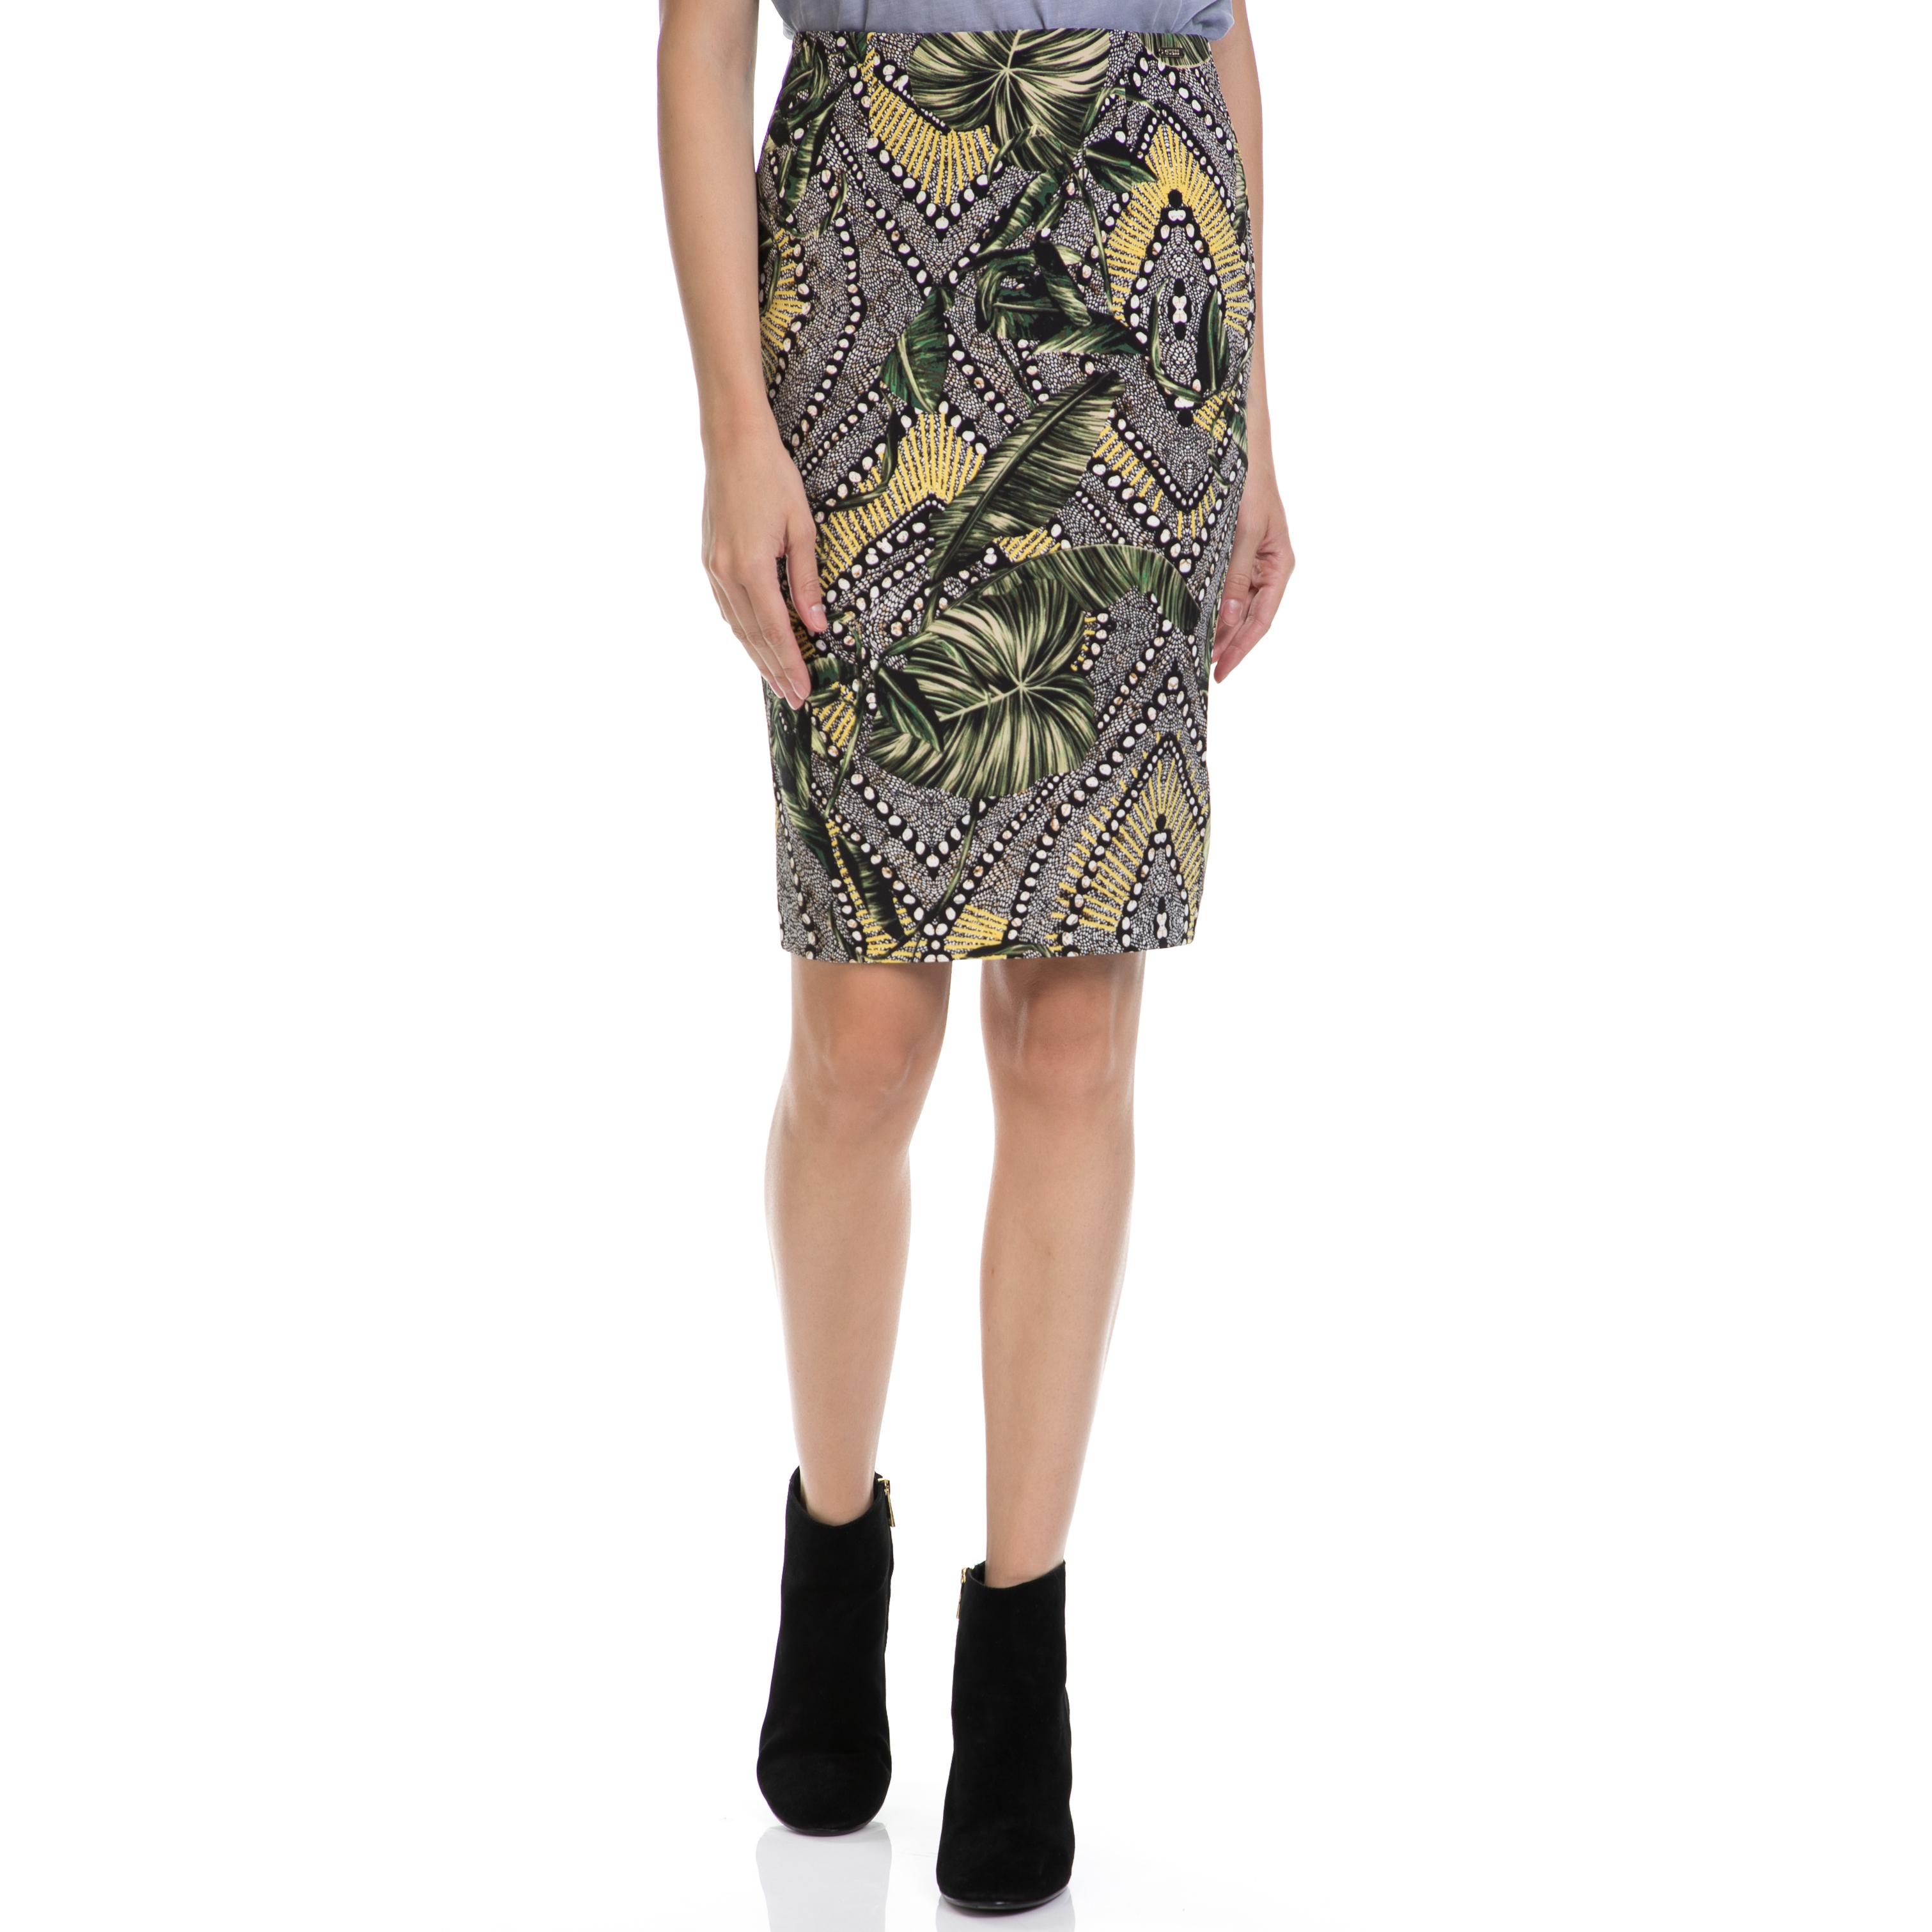 GUESS – Γυναικεία φούστα GUESS εμπριμέ 08a6384692e